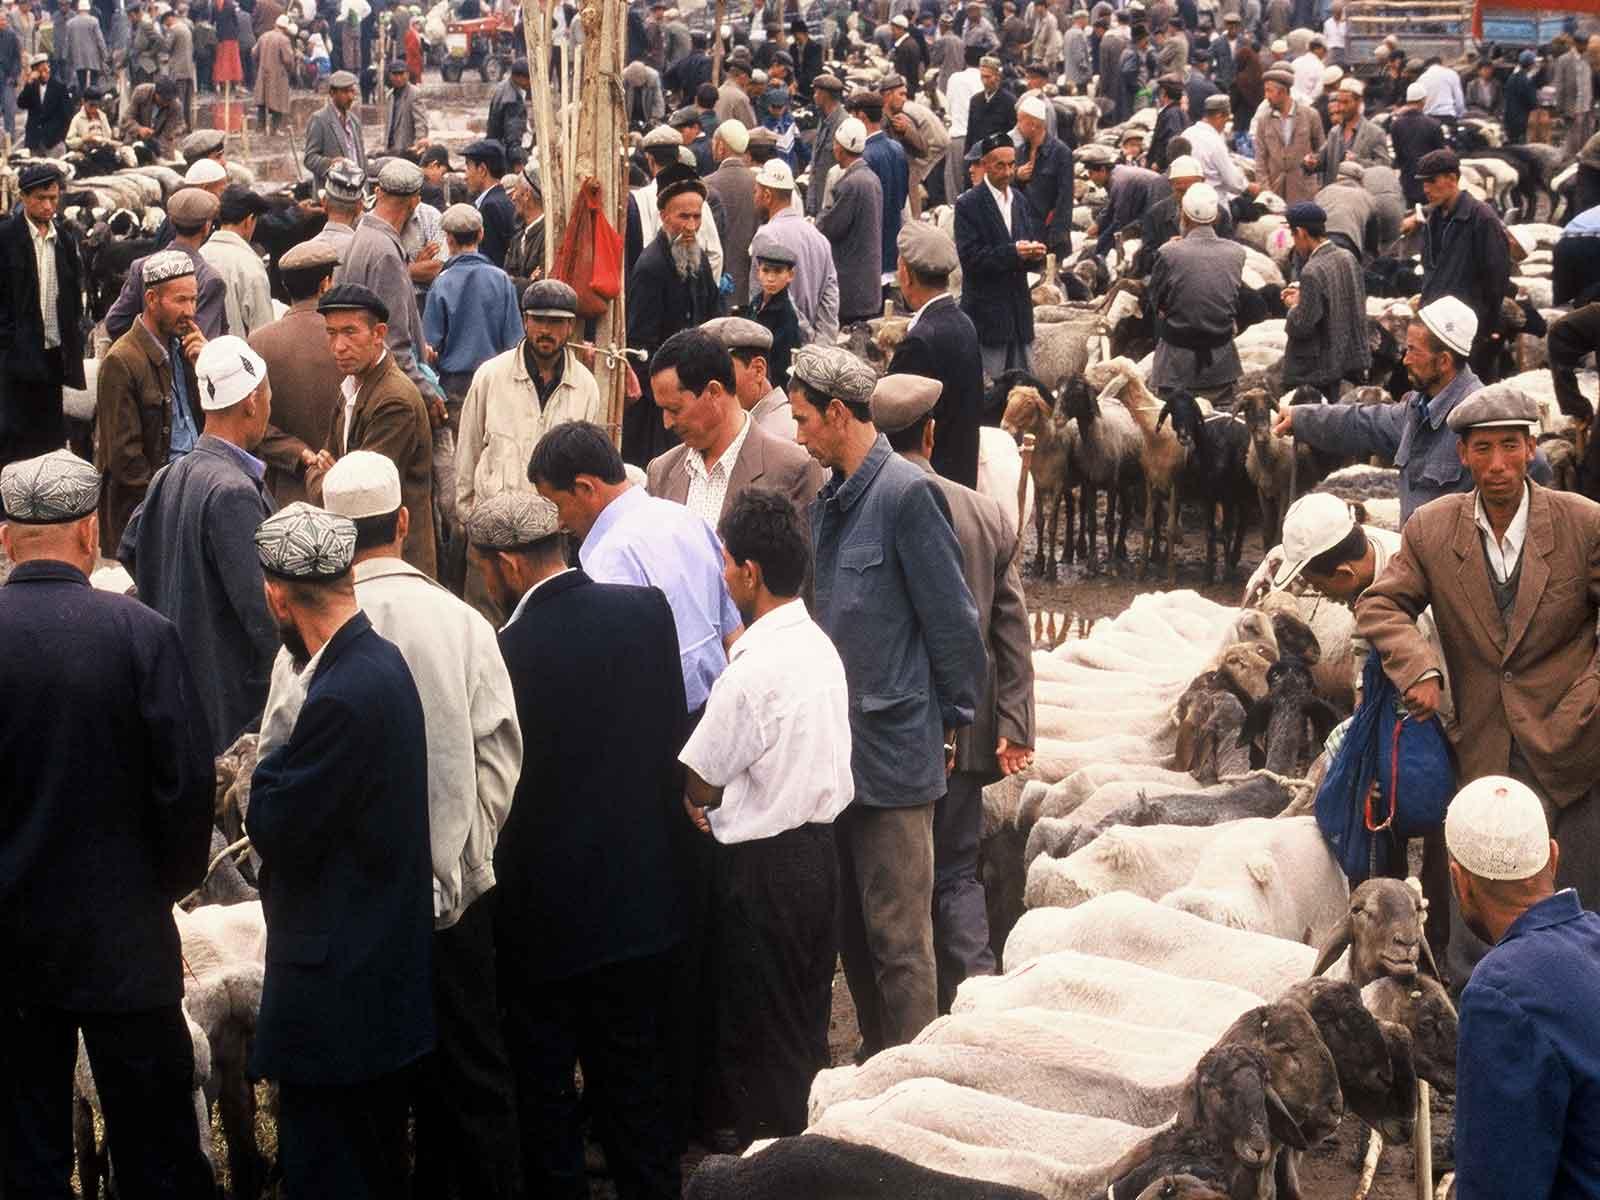 Livestock market - Kashgar Sunday Bazaar - China Silk Road Photo Journal Research - Steven Andrew Martin 2001